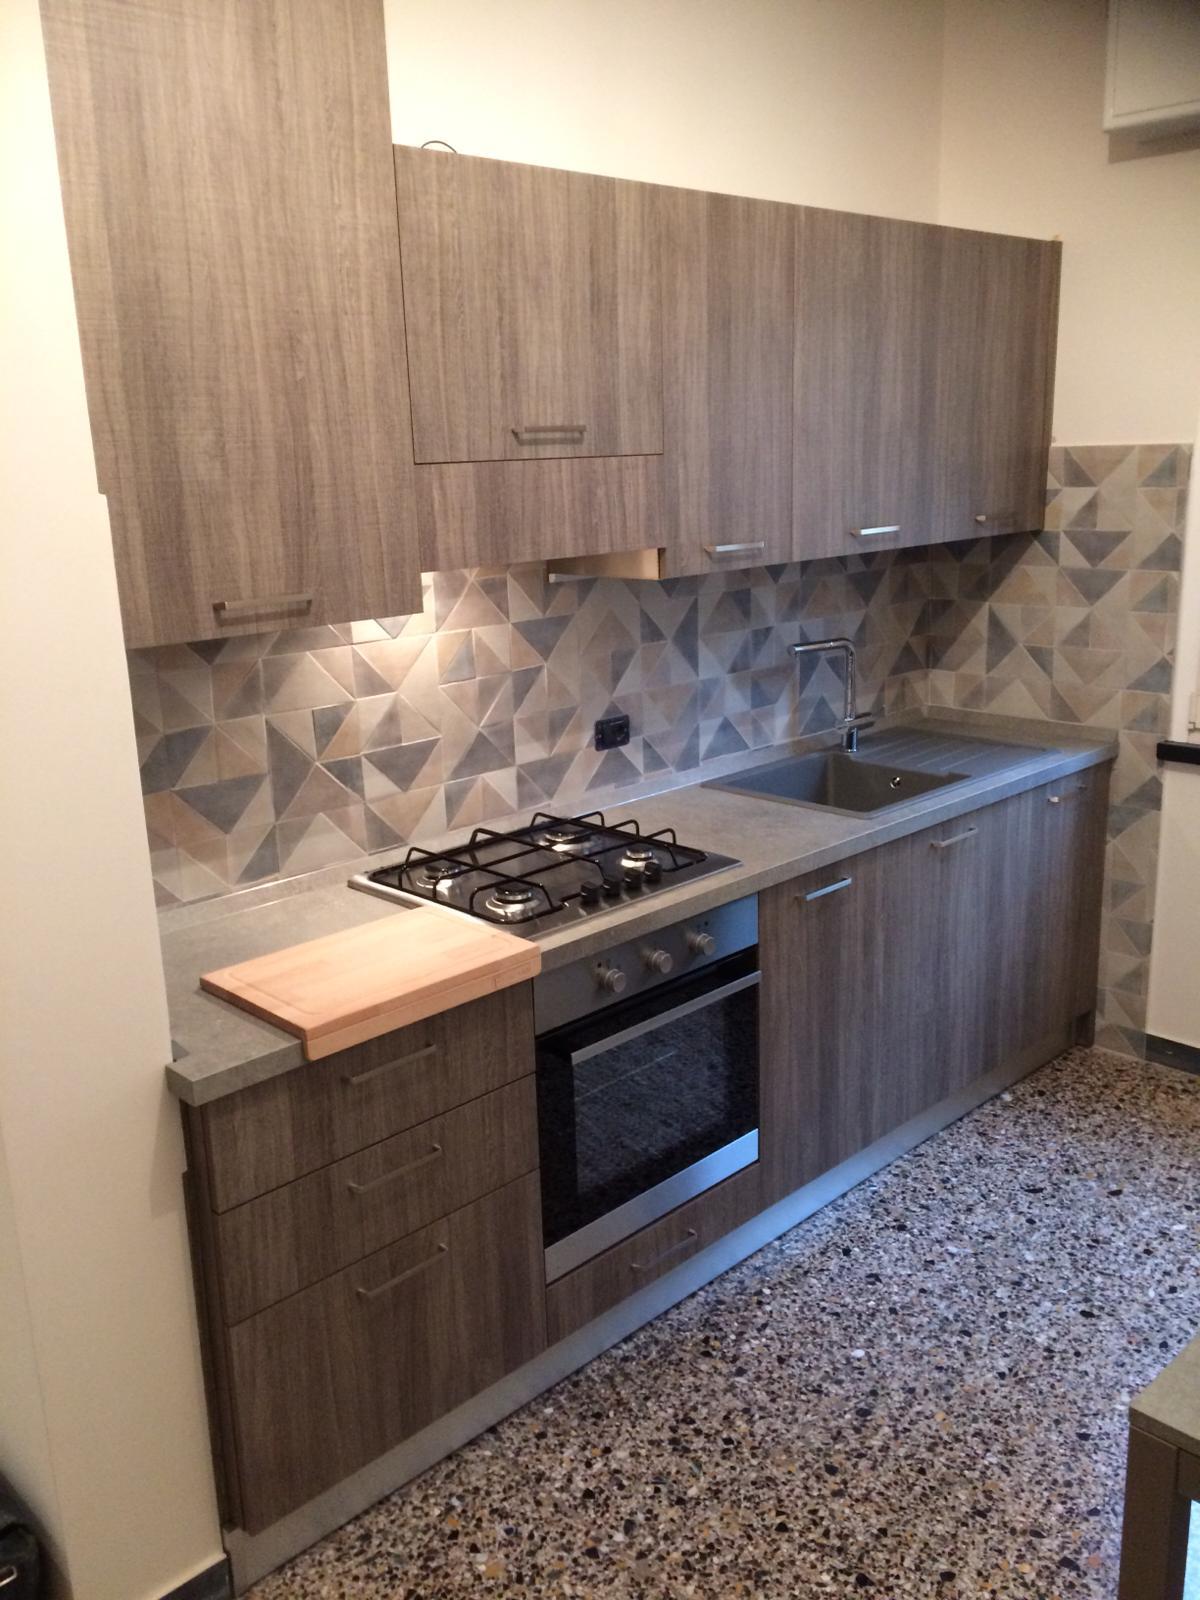 Cucine Moderne Semplici.Cucine Moderne Semplici Art 245 Fadini Mobili Cerea Verona